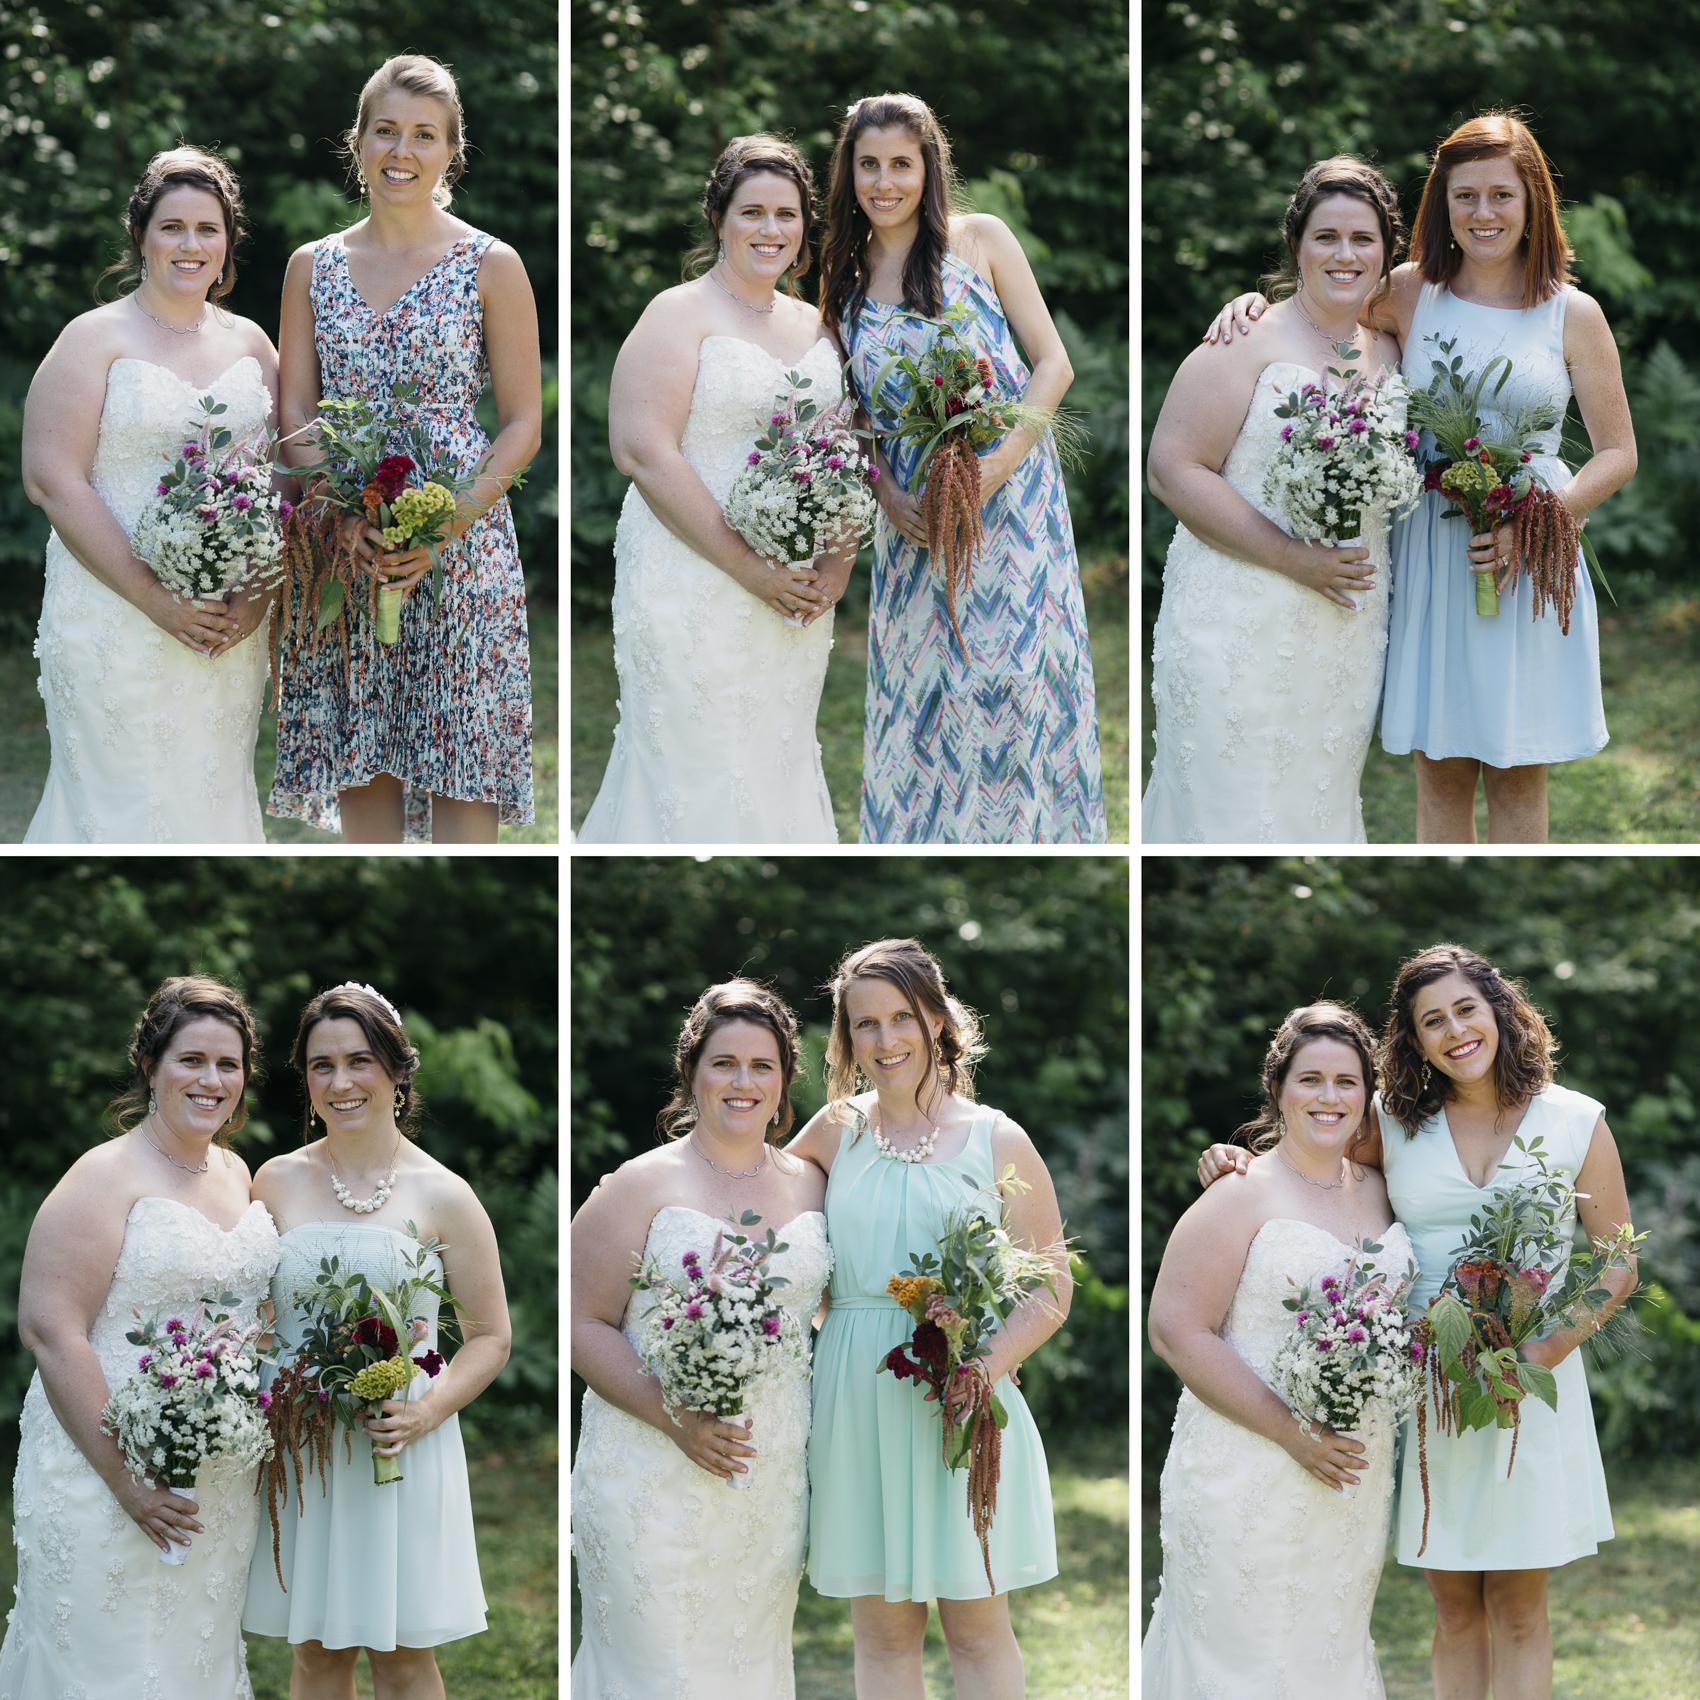 LFA_JuliaGlenn_Sugarloaf_Maine_Wedding003.jpg